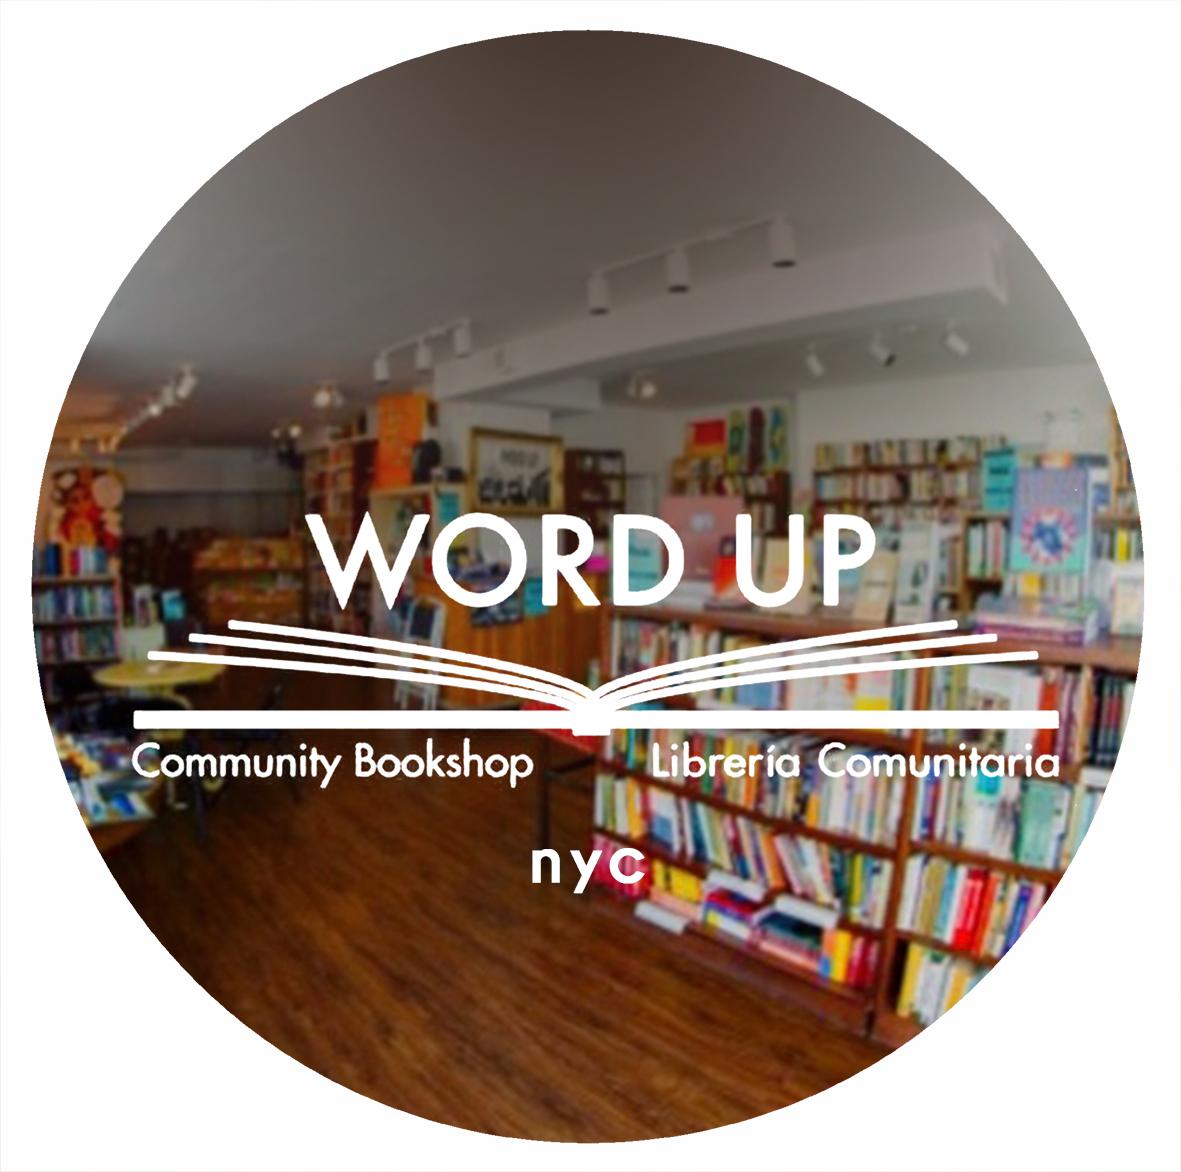 Copy of wordup community bookshop